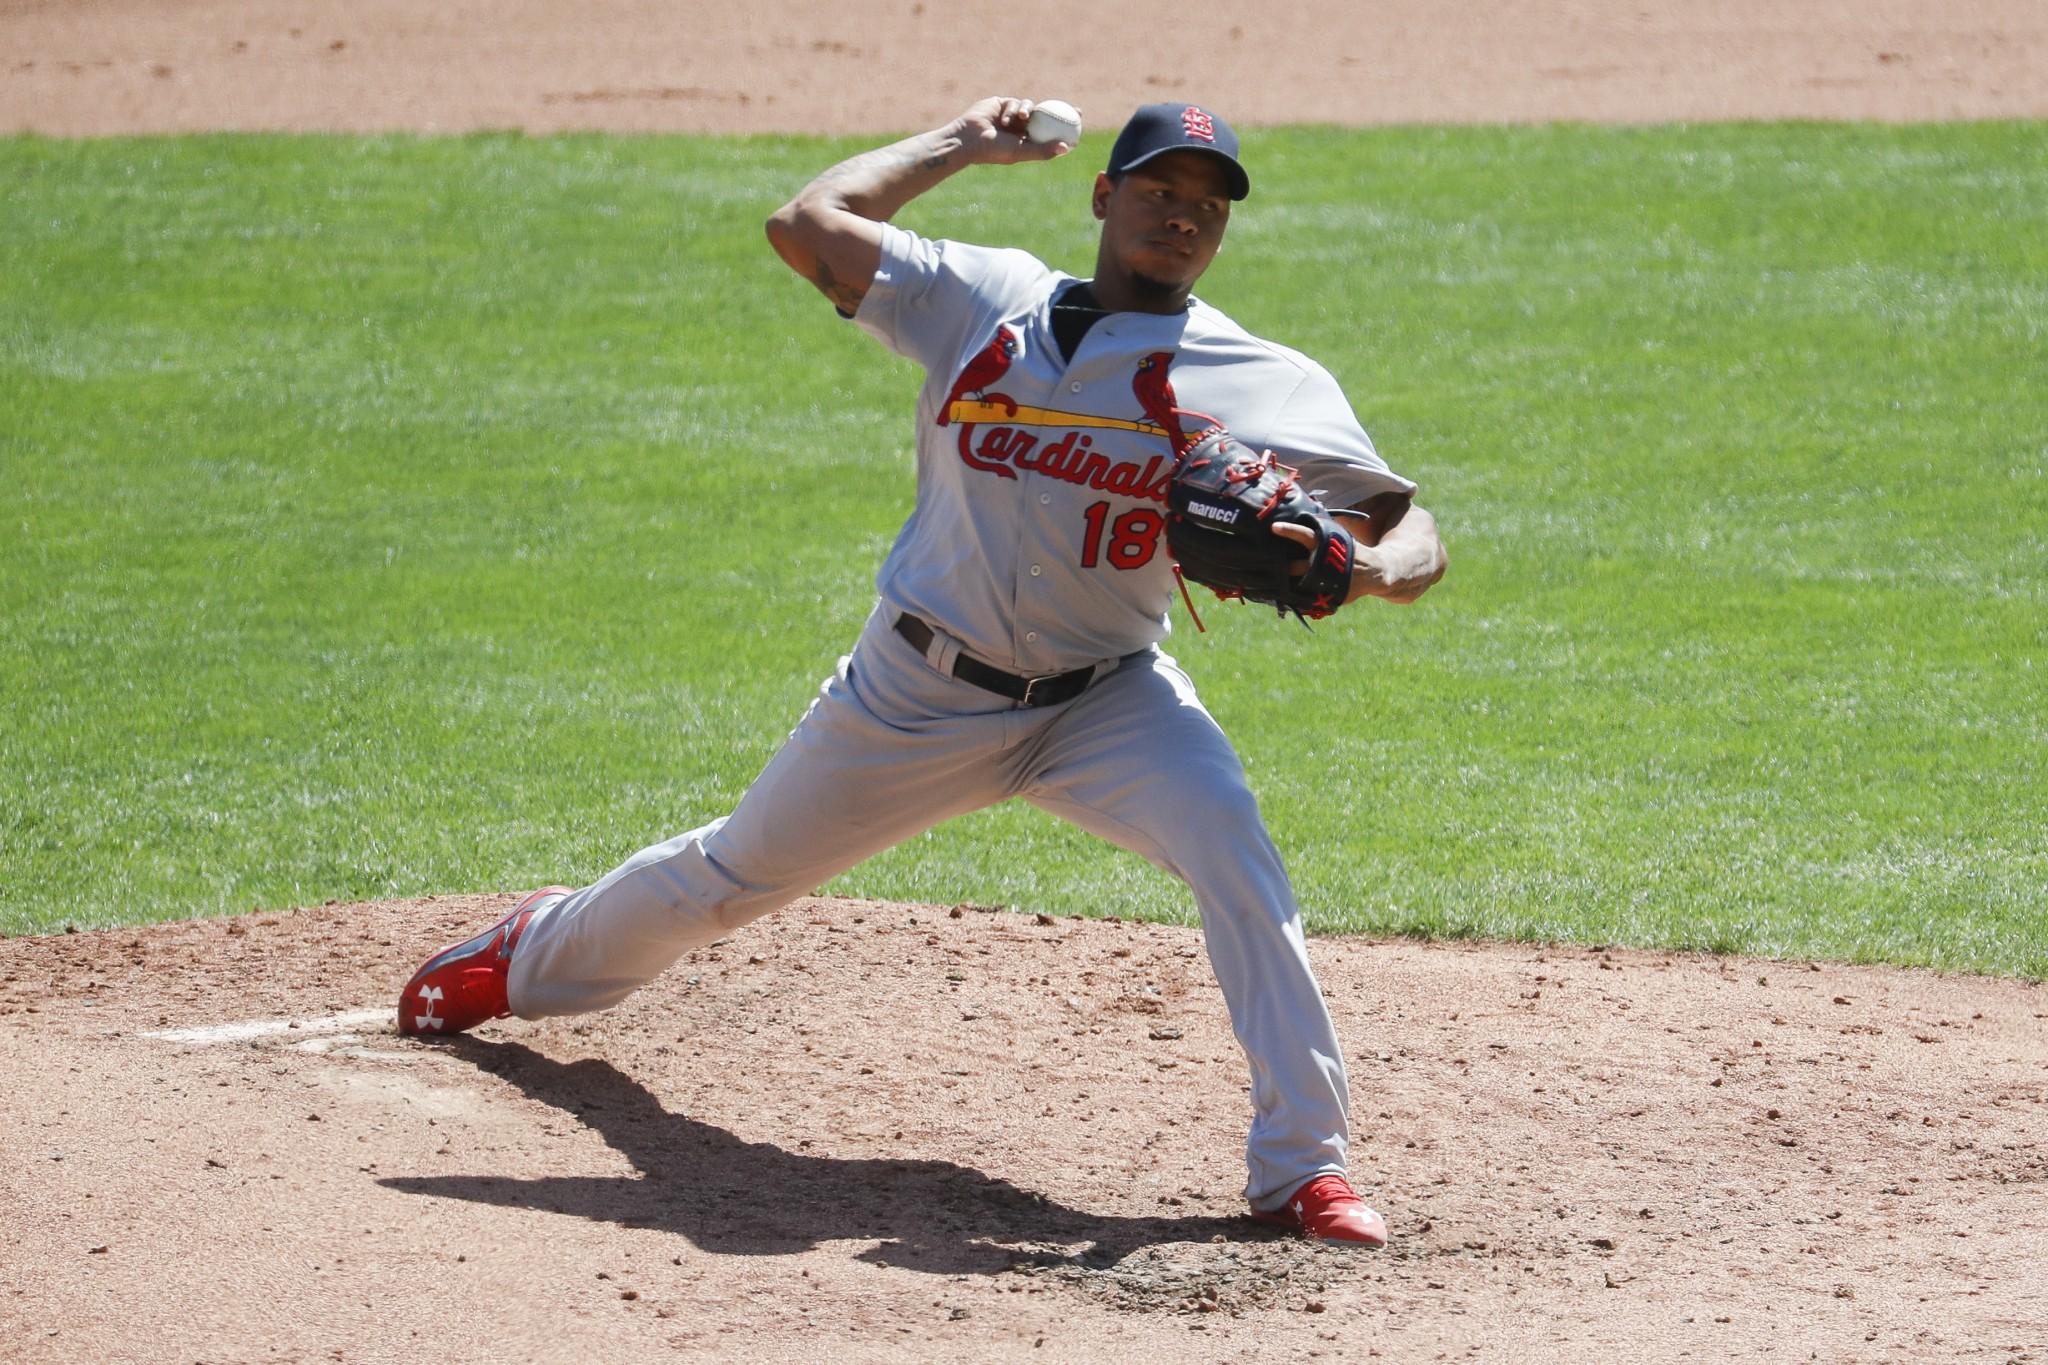 Martinez's Arm, Bat Help Cardinals to 5-3 Win Over Rockies